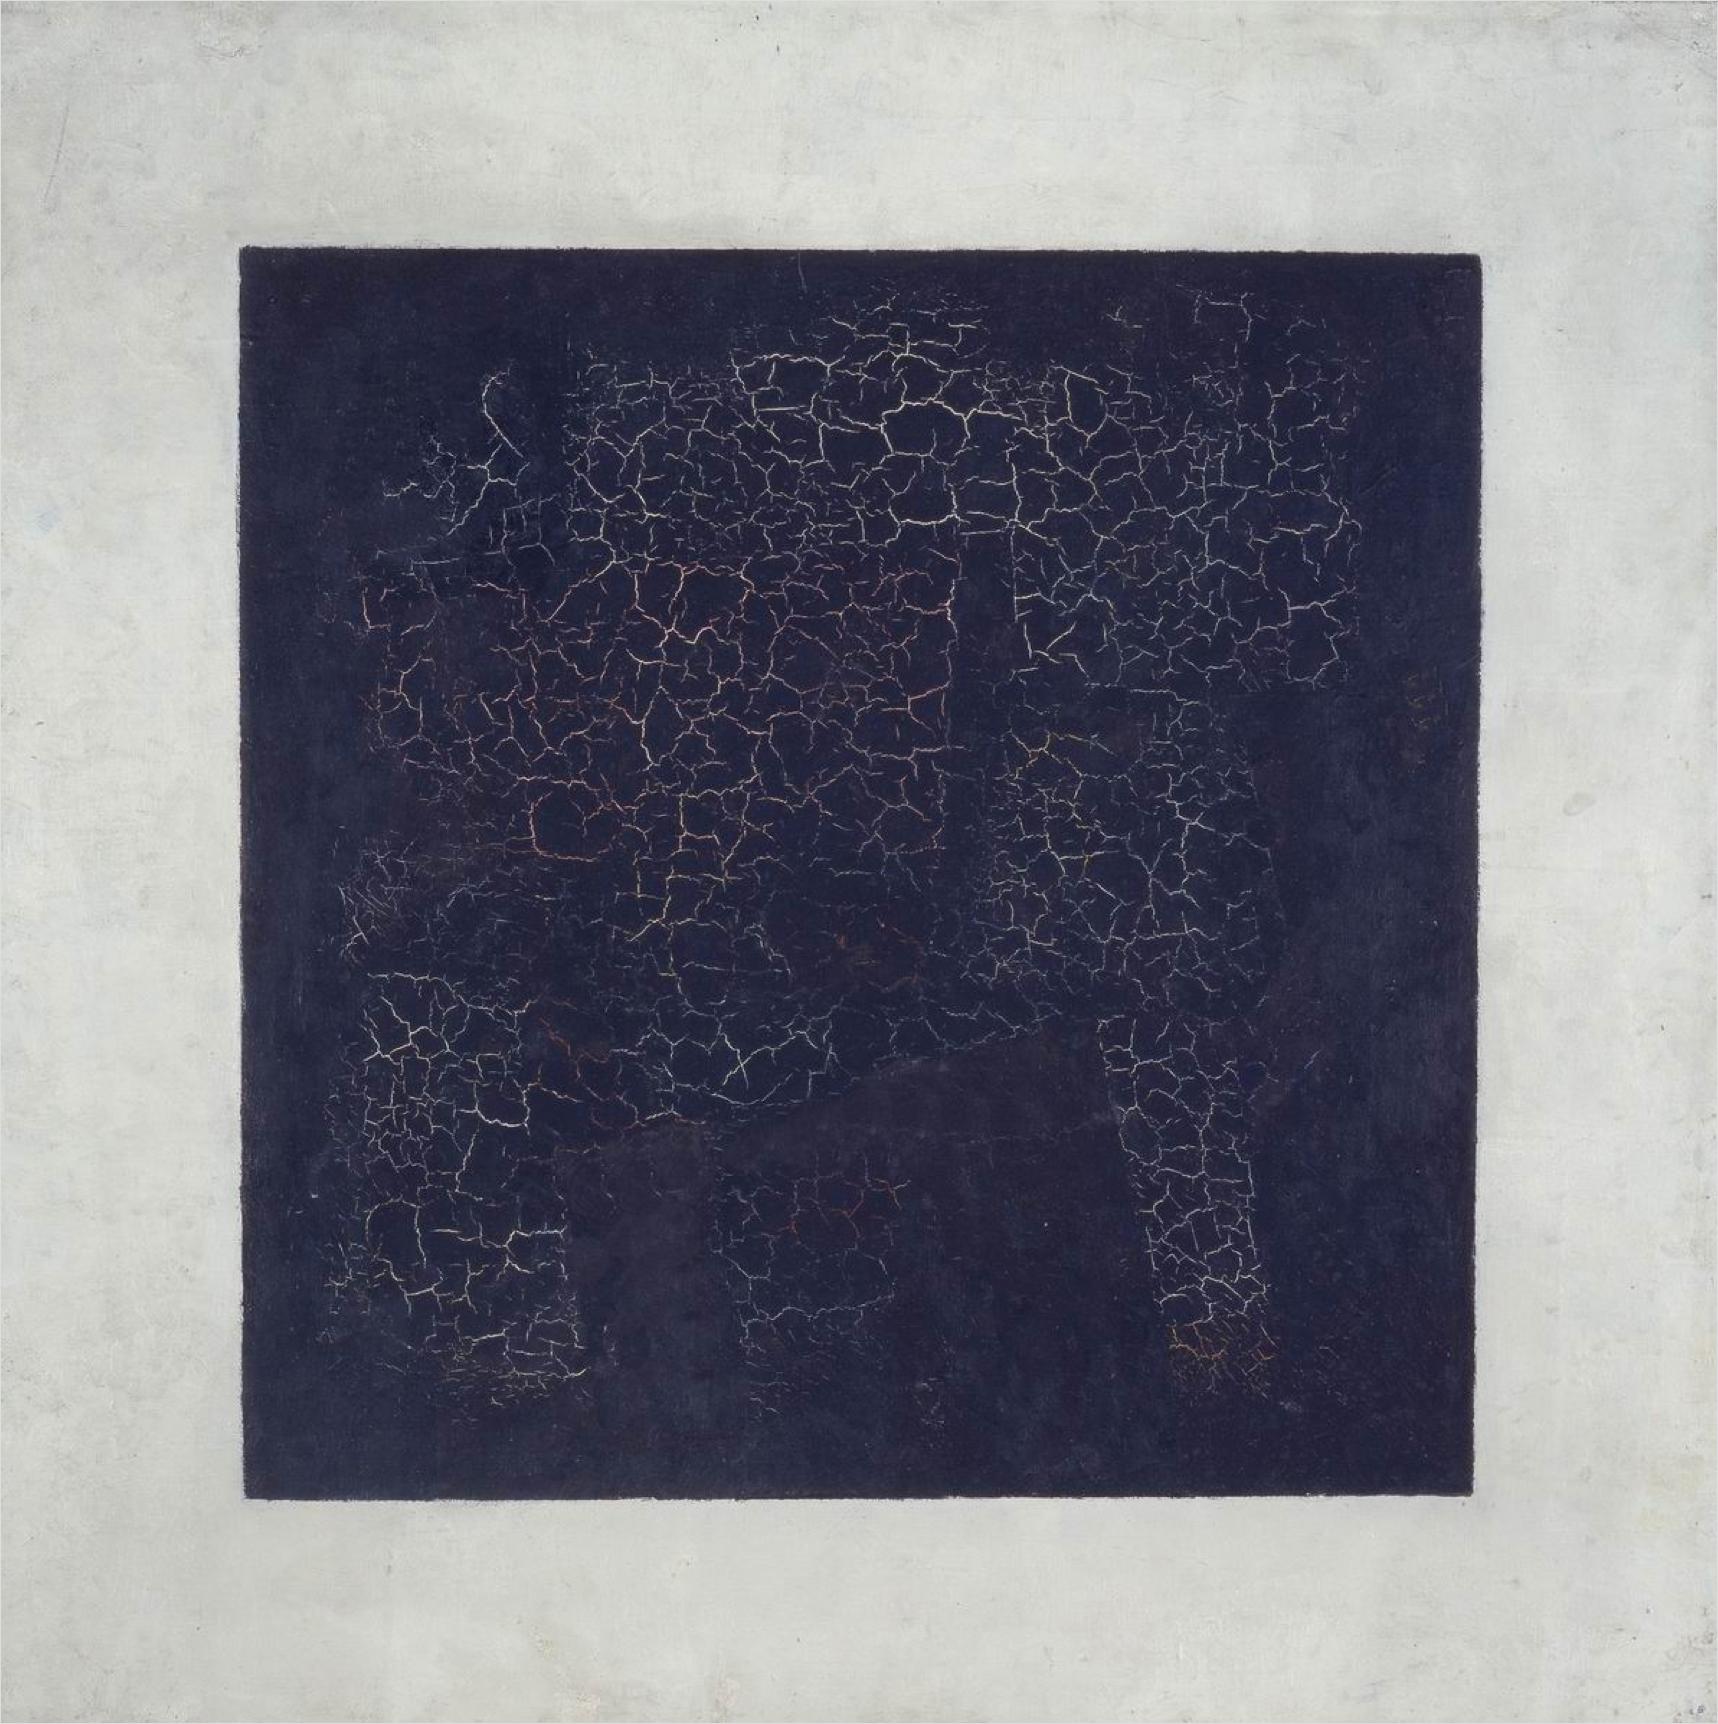 Kazimir Malevich,  Black Square , 1915, Tretyakov Gallery, Moscow.